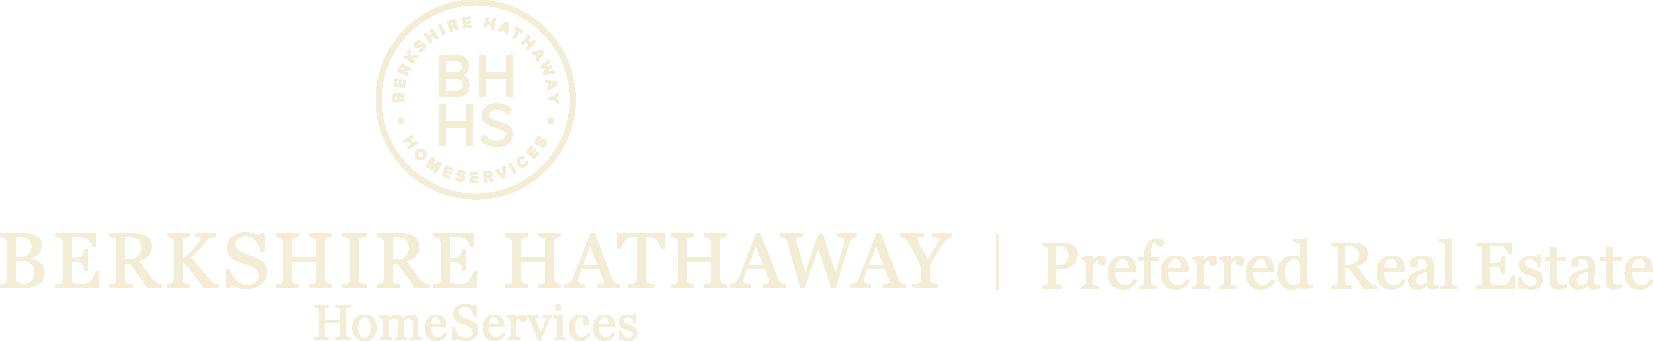 Berkshire Hathaway Preferred Auburn - Logo